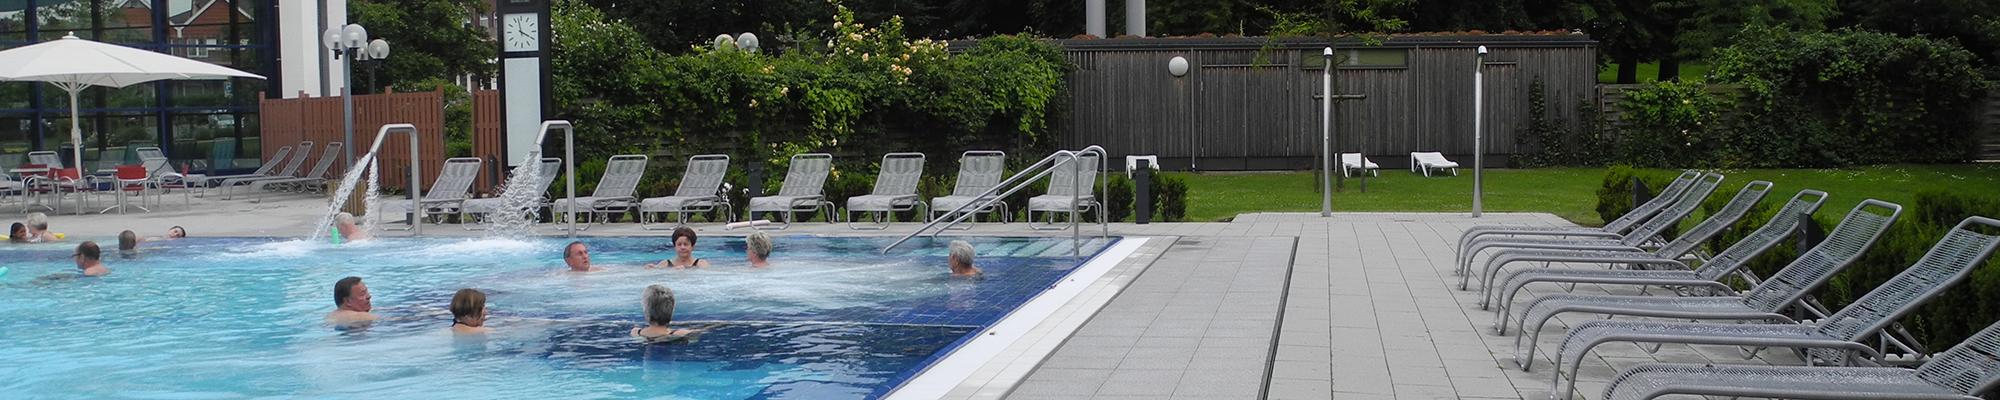 banner-landgrafentherme-bad-nenndorf-aussenbecken-schwimmen-liegen-bodenbelag-platten